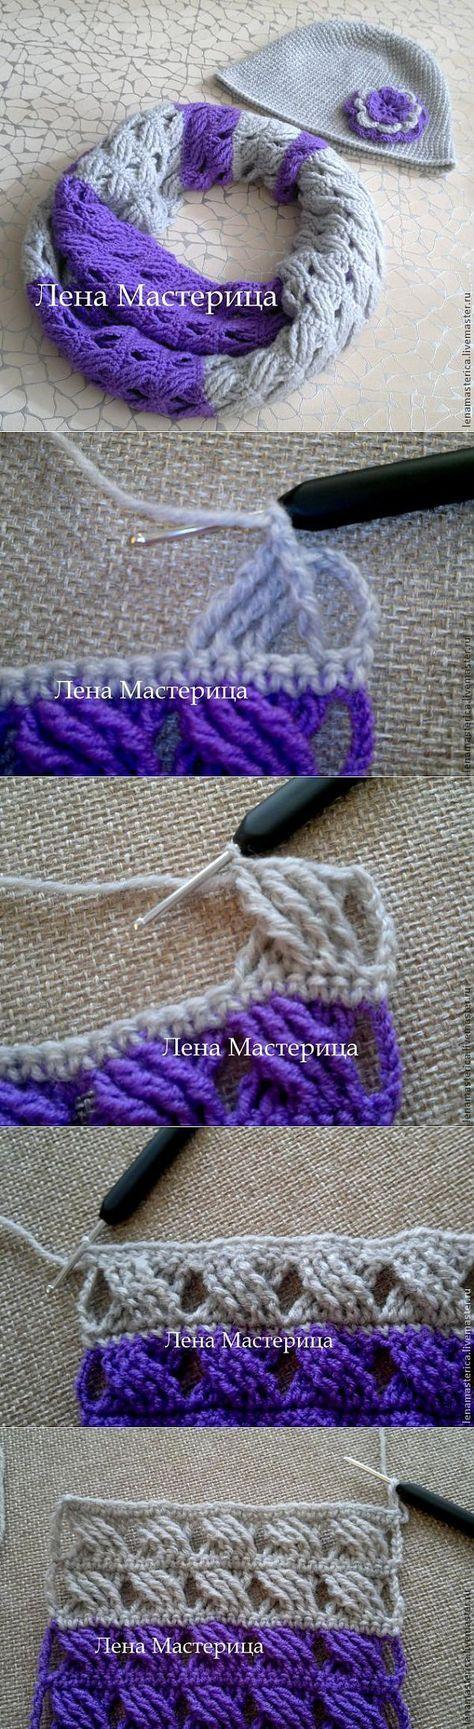 Learn to crochet a beautiful, |